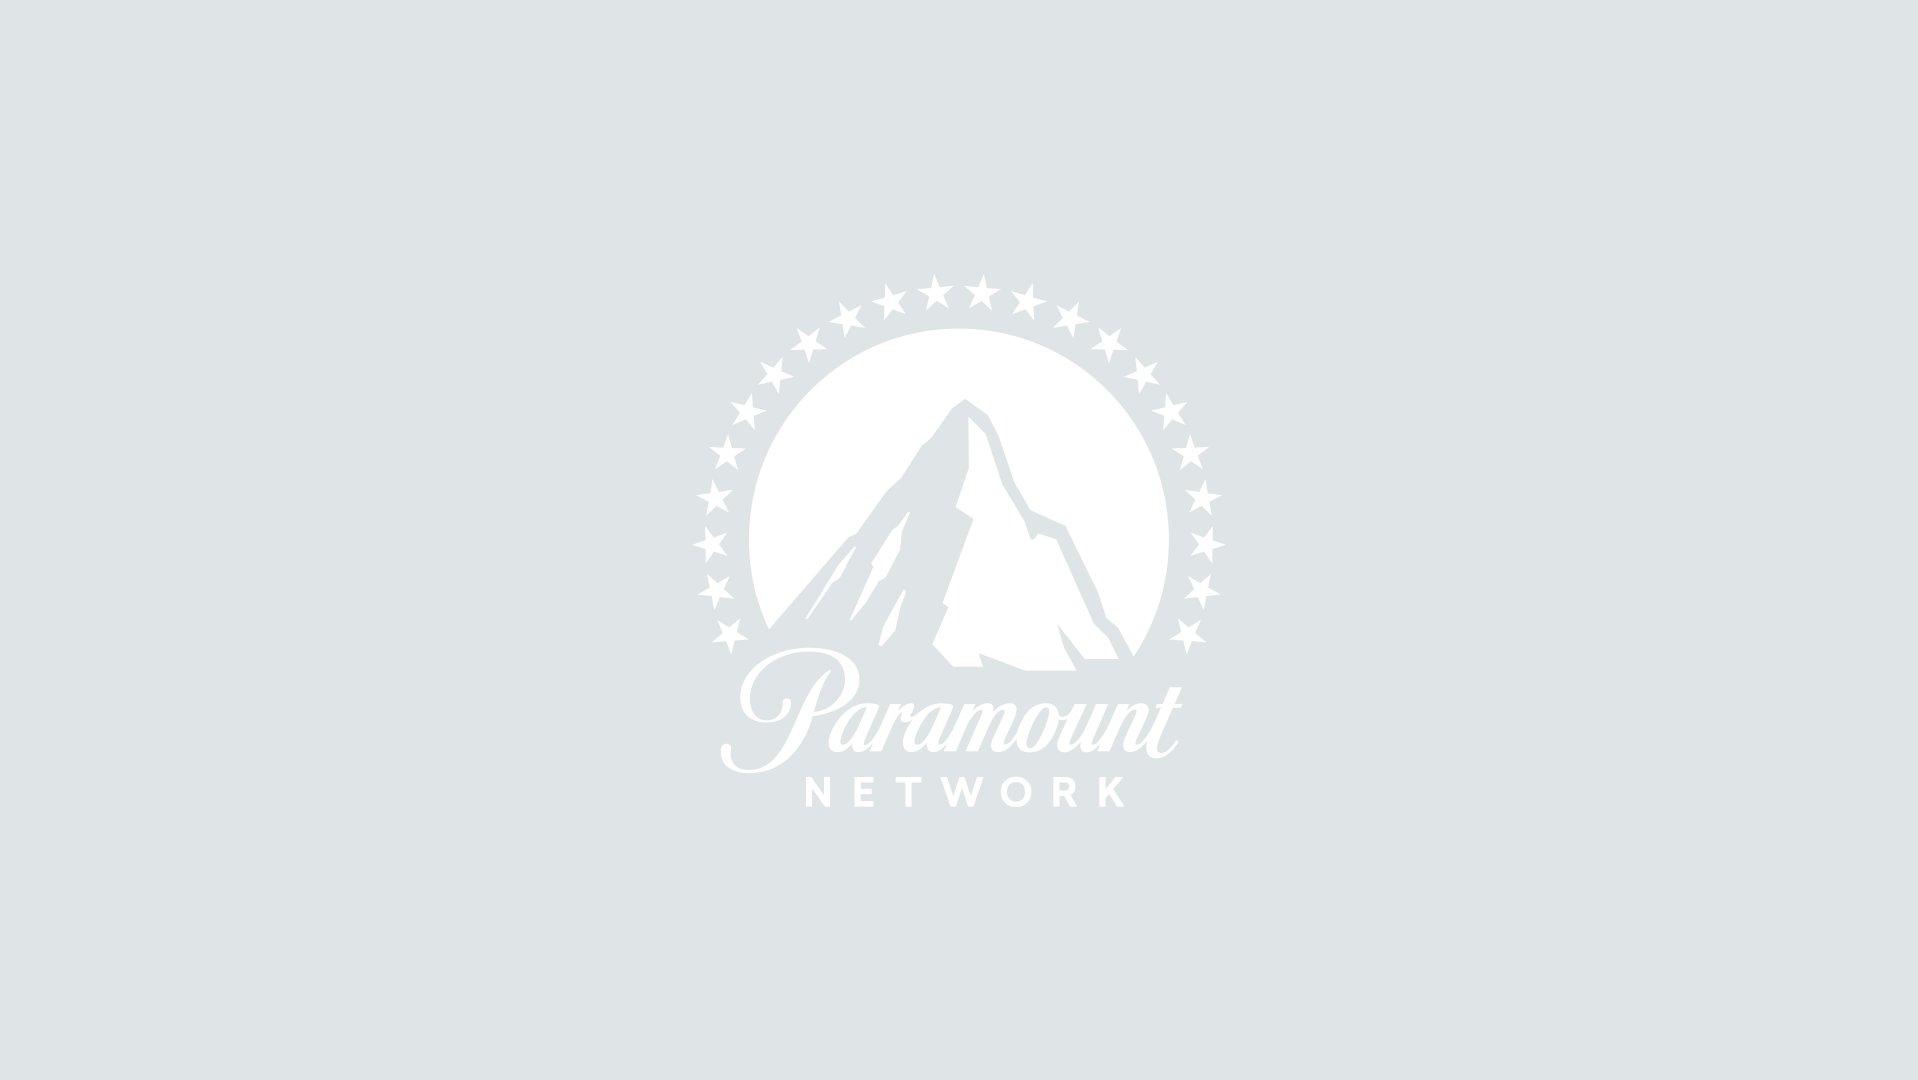 Leonardo DiCaprio e Kate Winslet (Titanic), foto: Getty Images